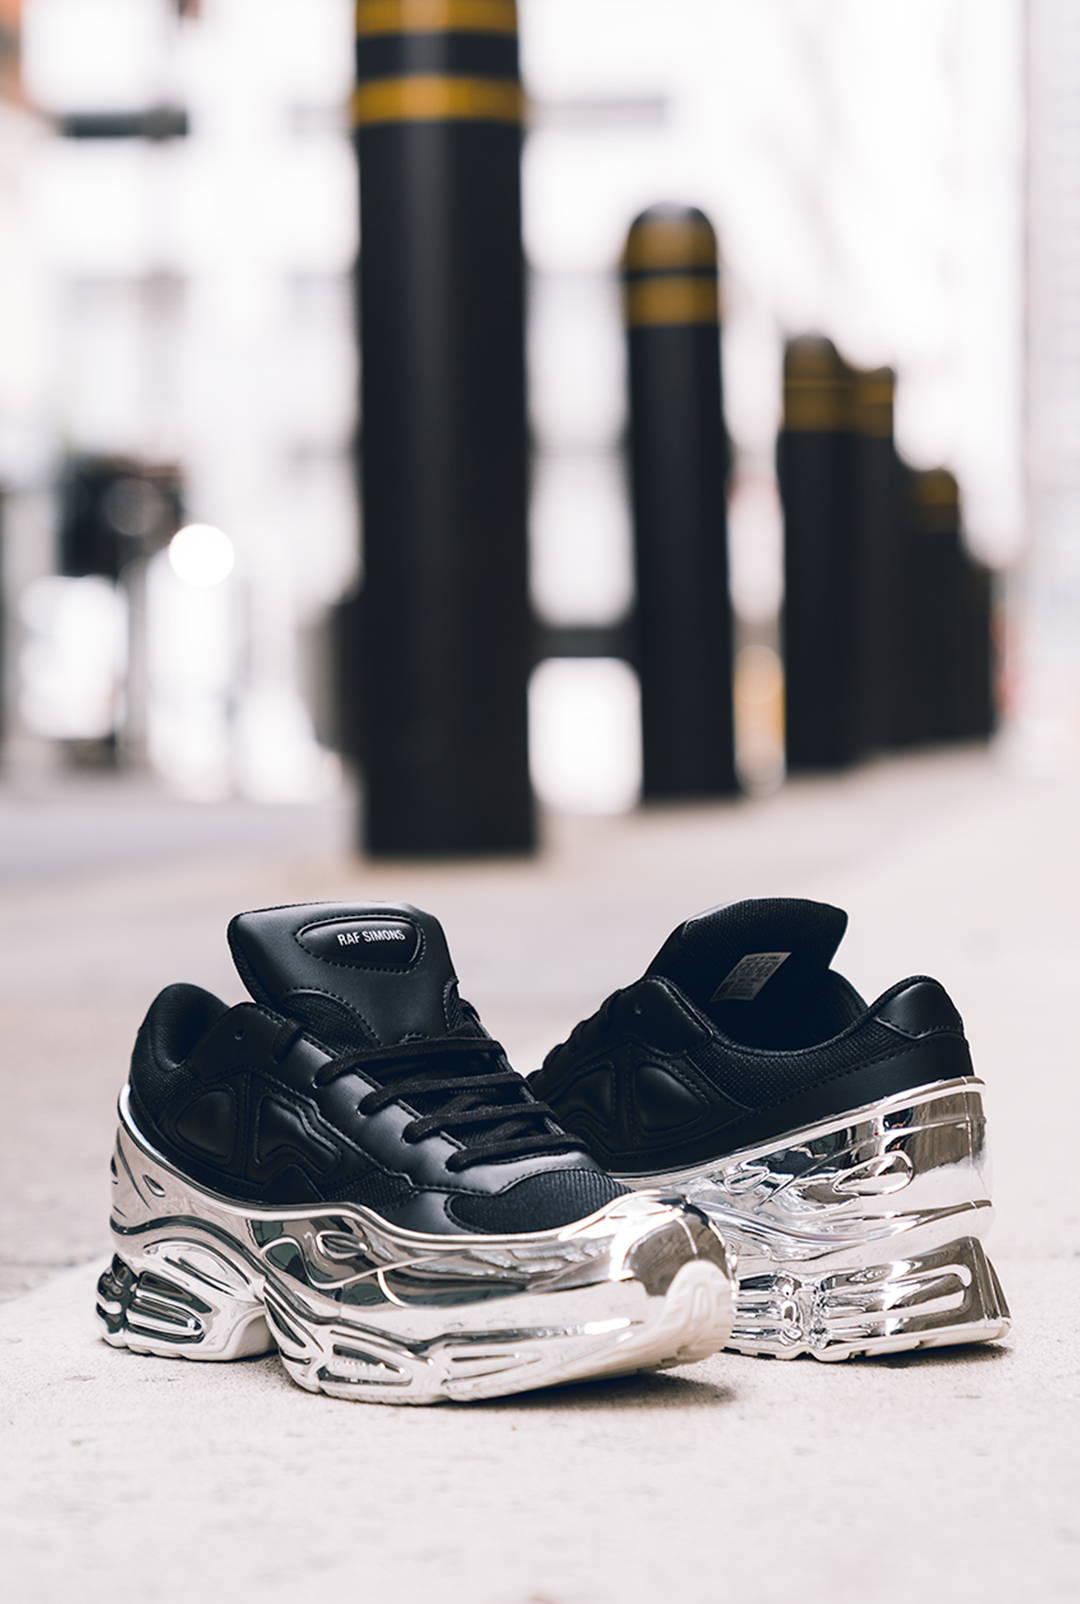 Black adidas by Raf Simons Ozweego sneakers